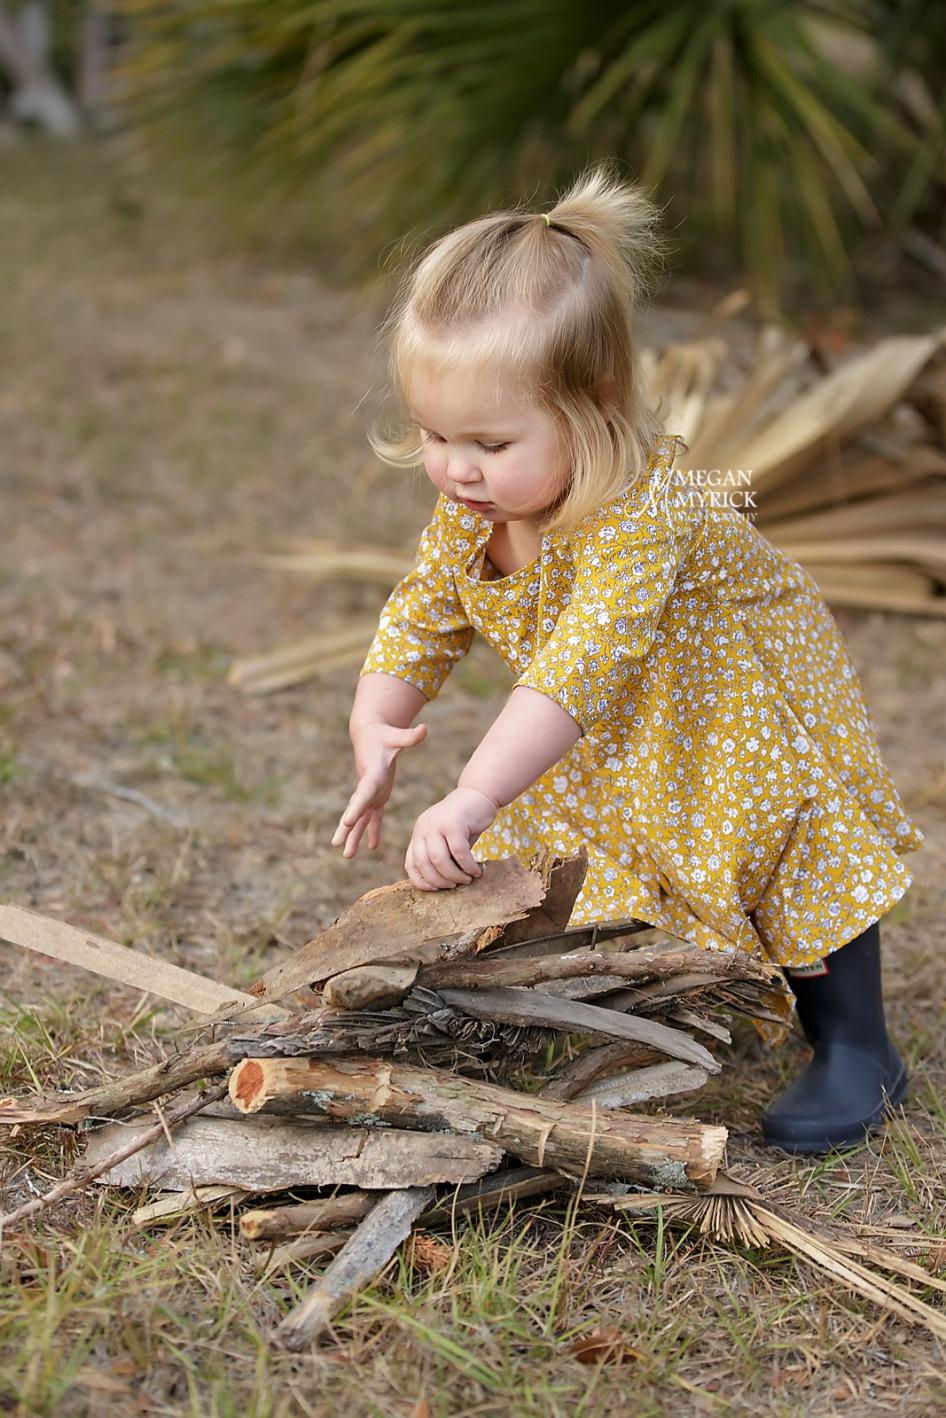 Pooler Child Photographer | Megan Myrick Photography| www.meganmyrickphotography.com